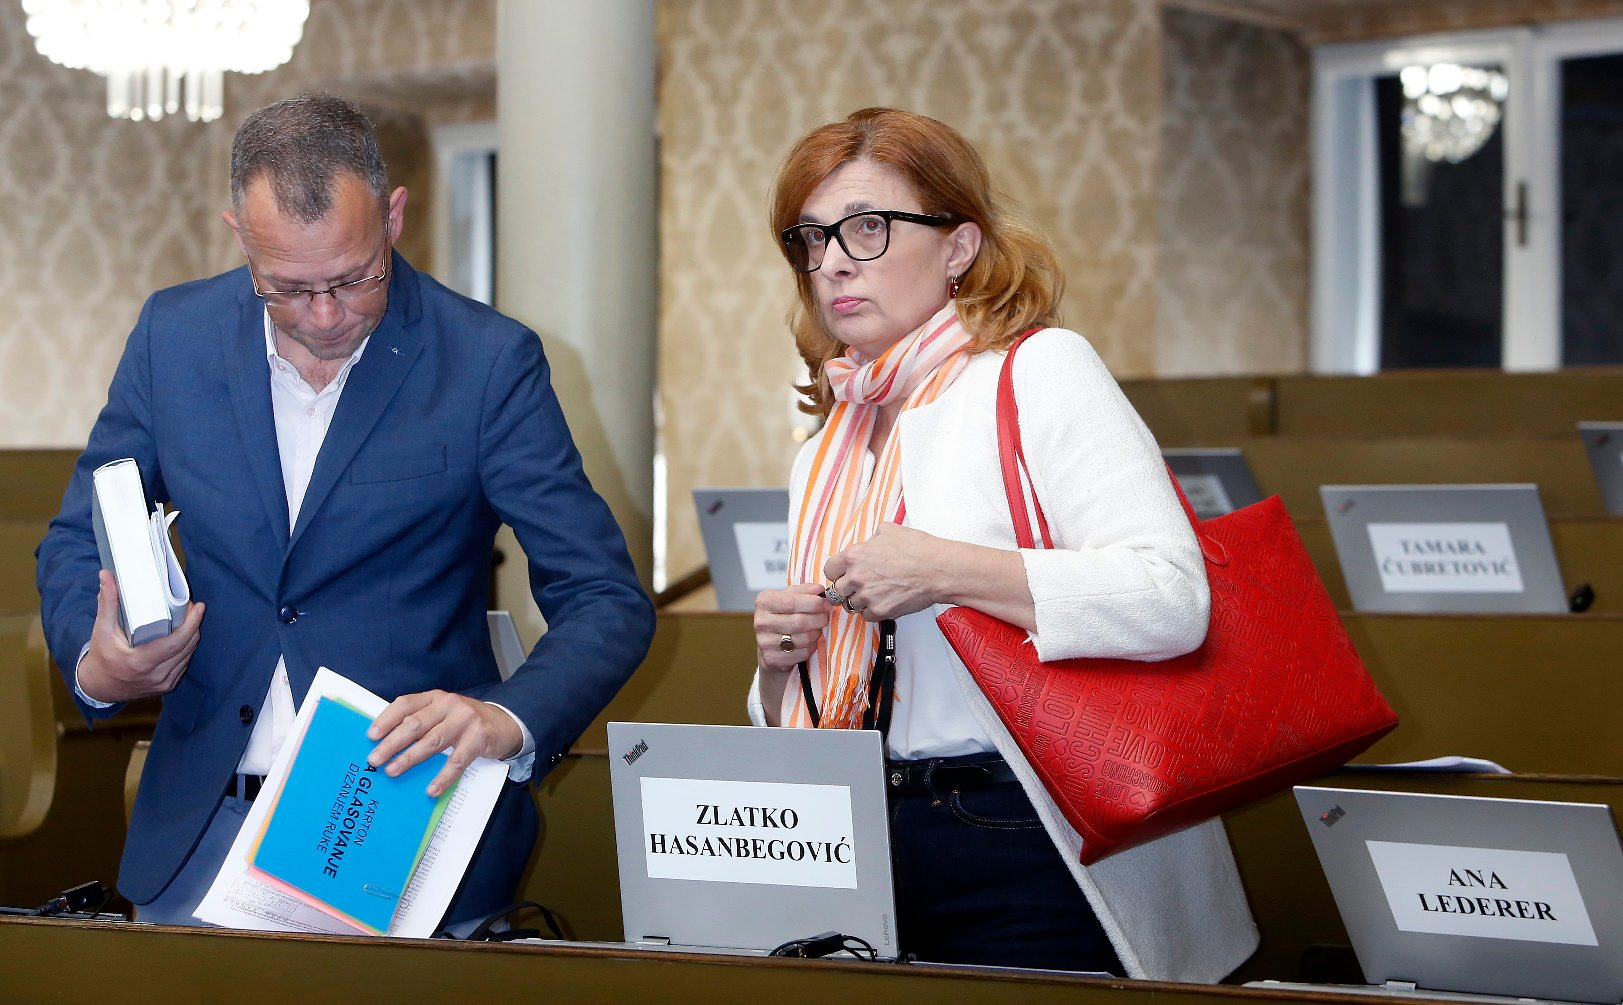 Zlatko Hasanbegović i Ana Lederer